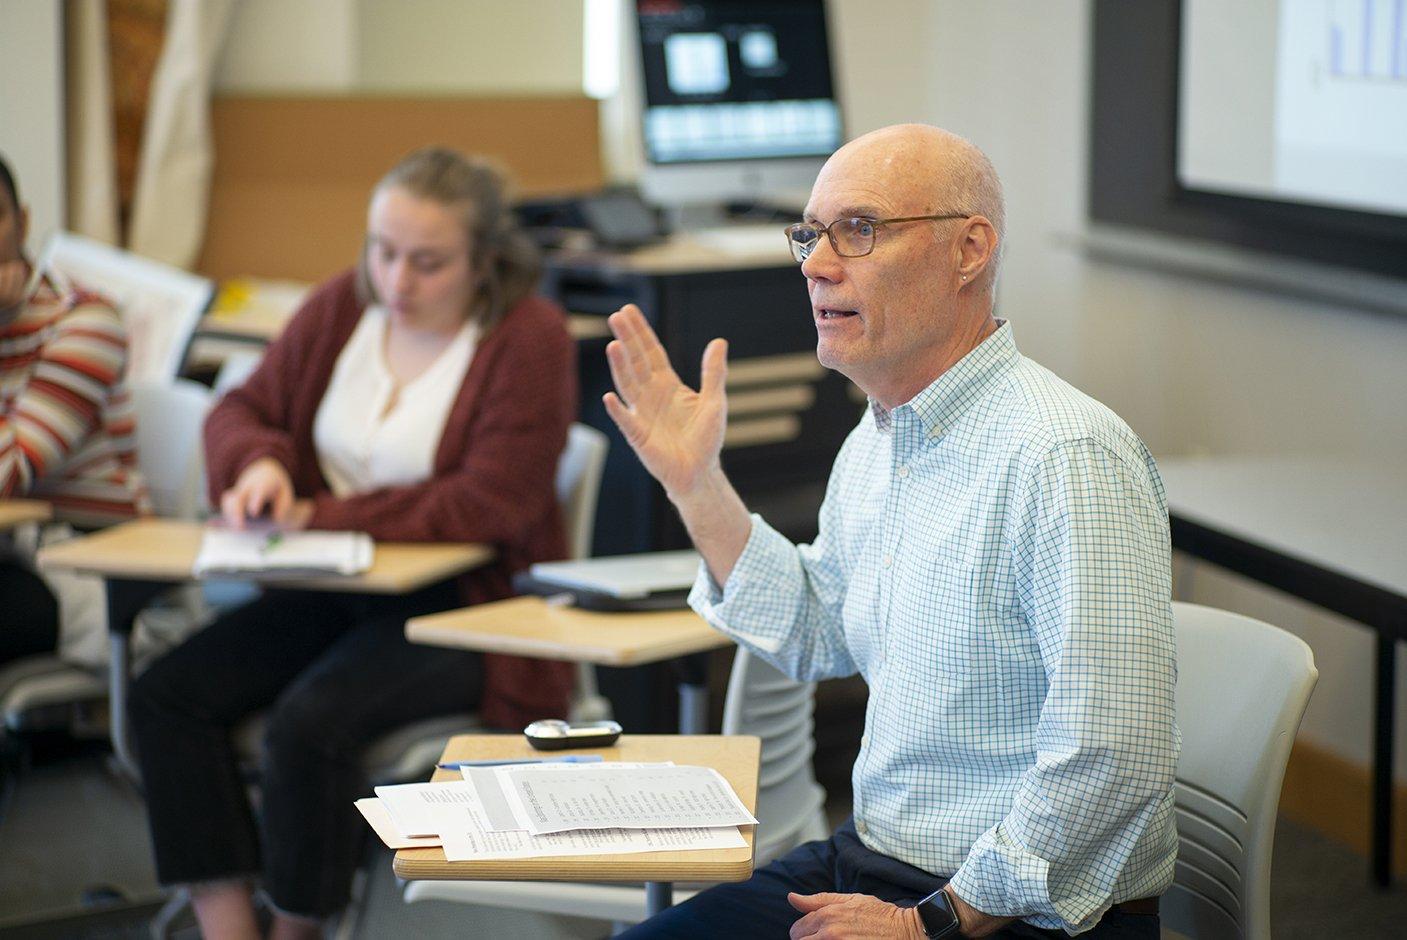 Professor Dorsey in the midst of teaching.